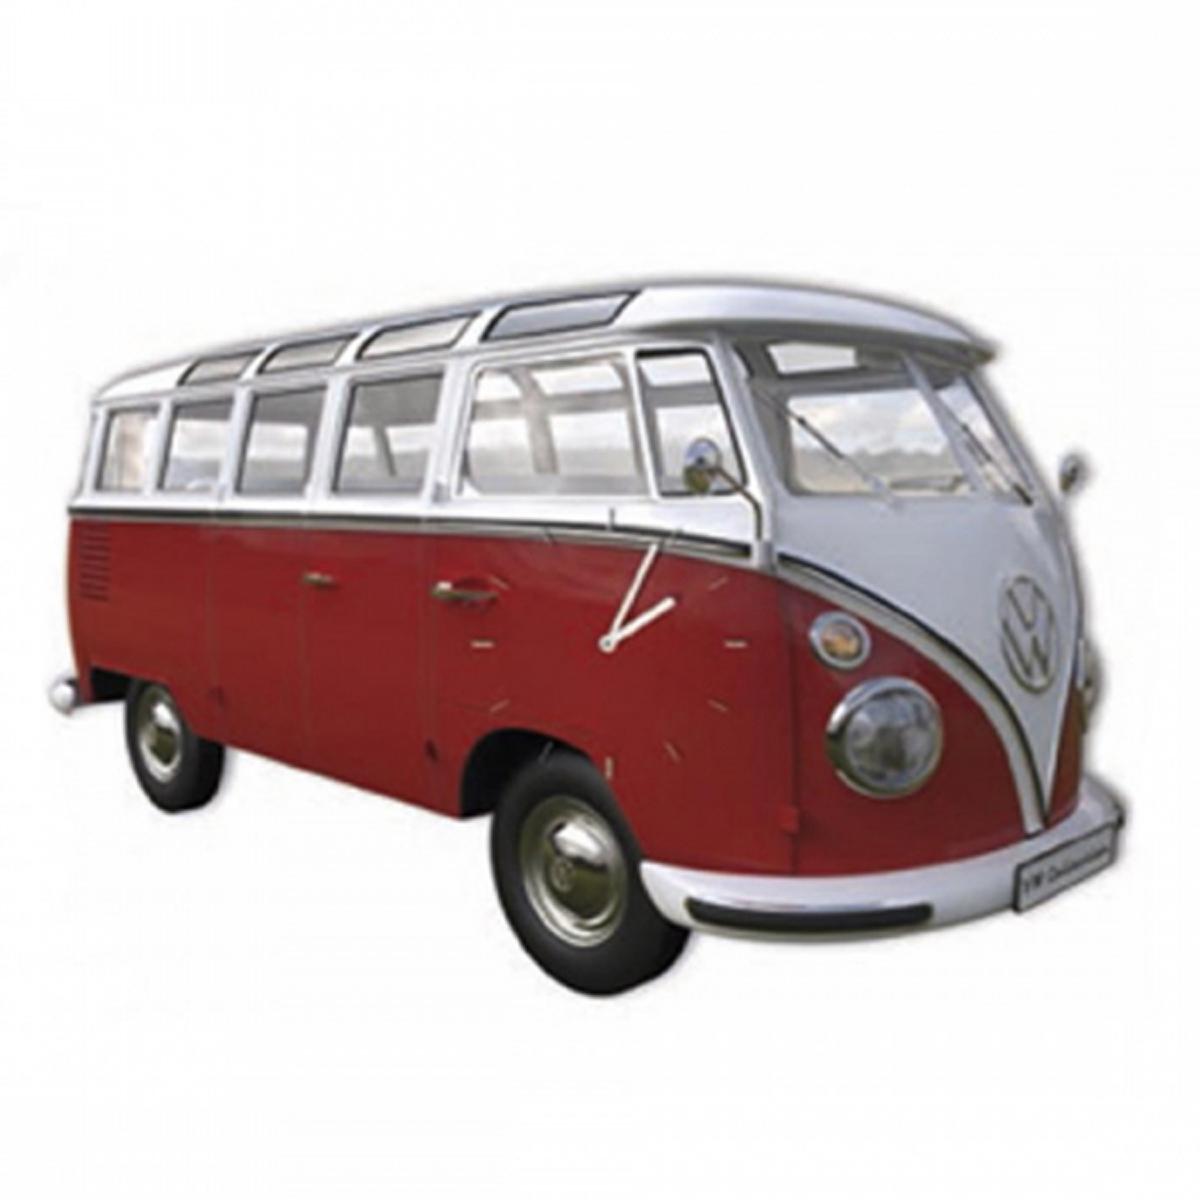 Horloge Murale bois \'Volkswagen\' rouge blanc - 28x18 cm - [R1958]